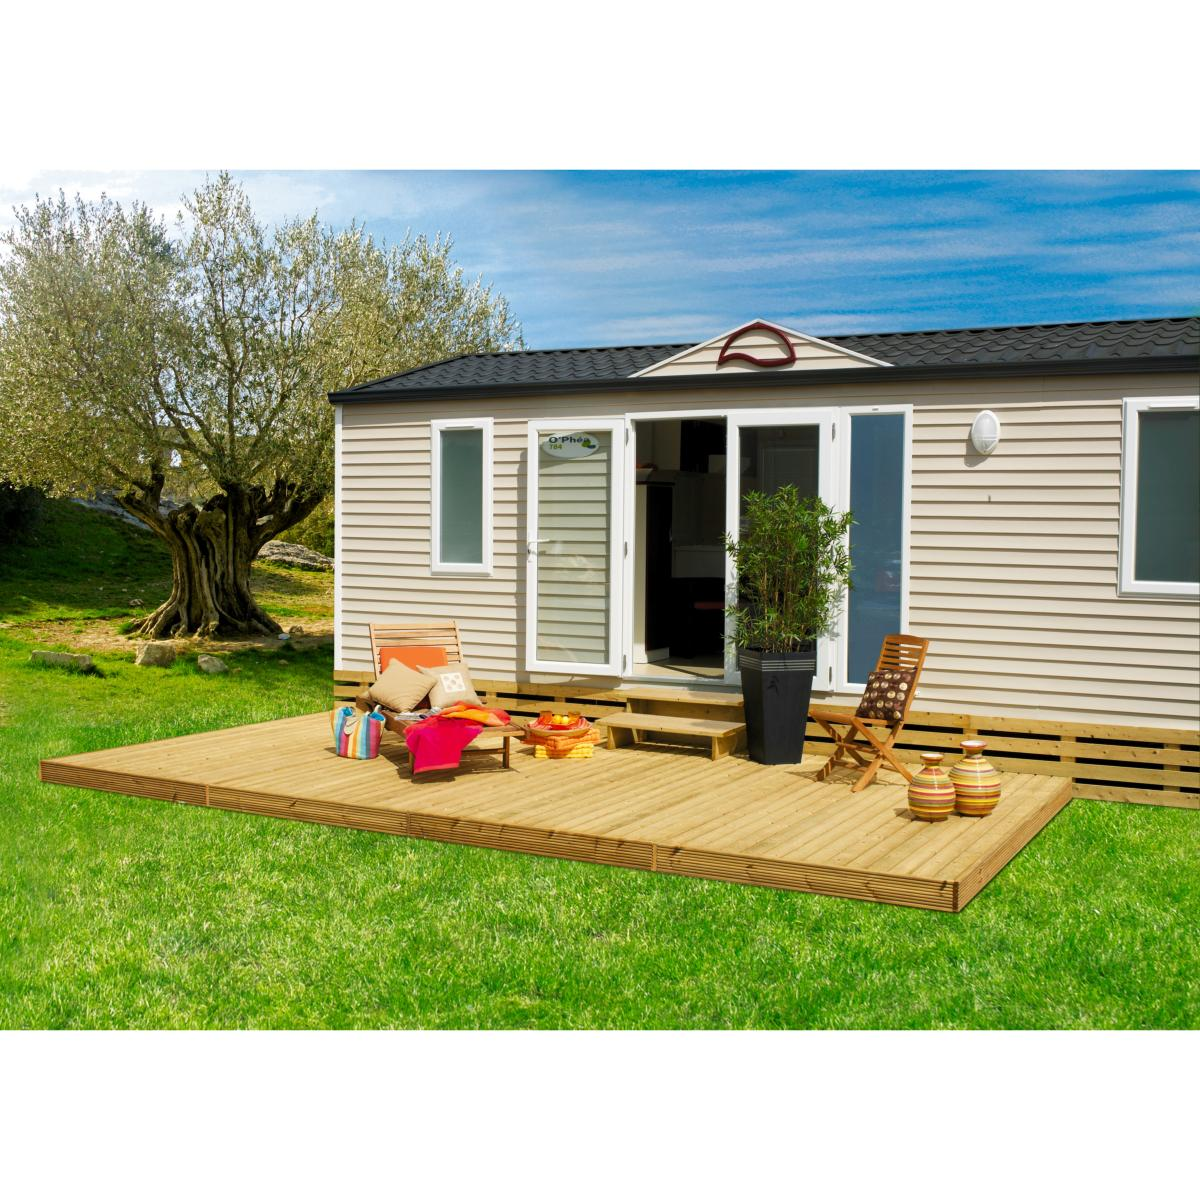 terrasse clairval de mobil 39 home calvi 3m. Black Bedroom Furniture Sets. Home Design Ideas